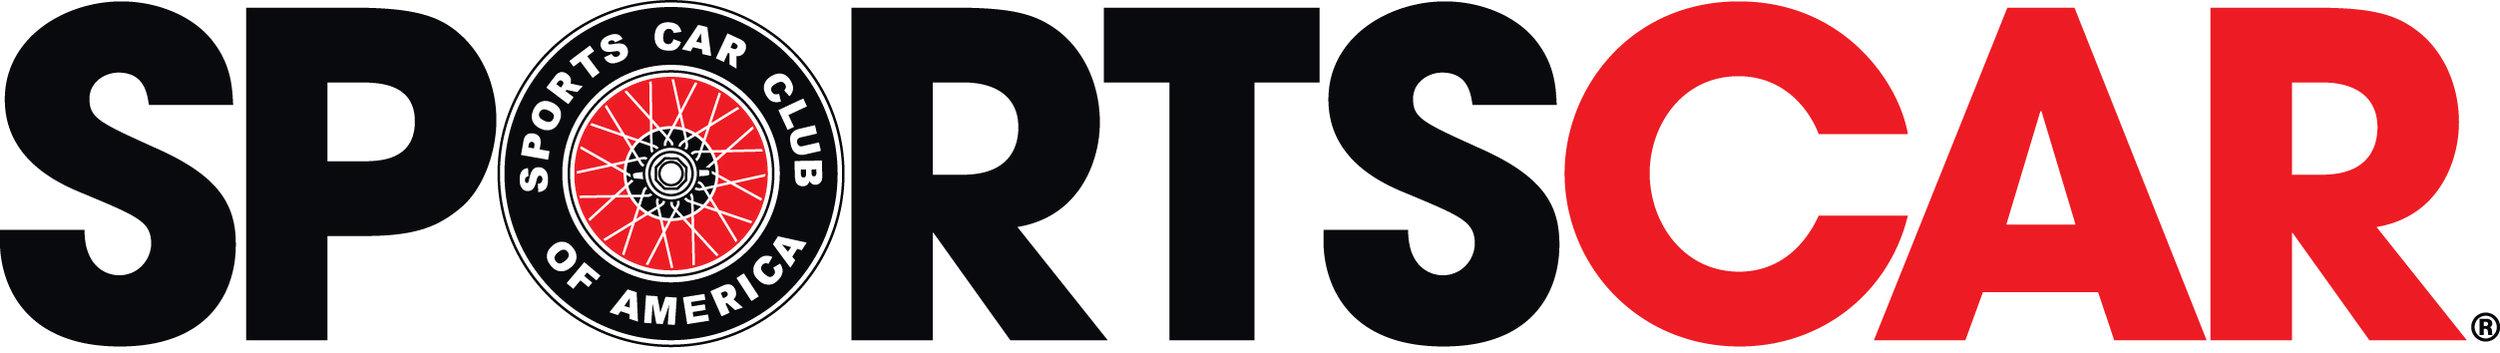 SportsCar2013.jpg